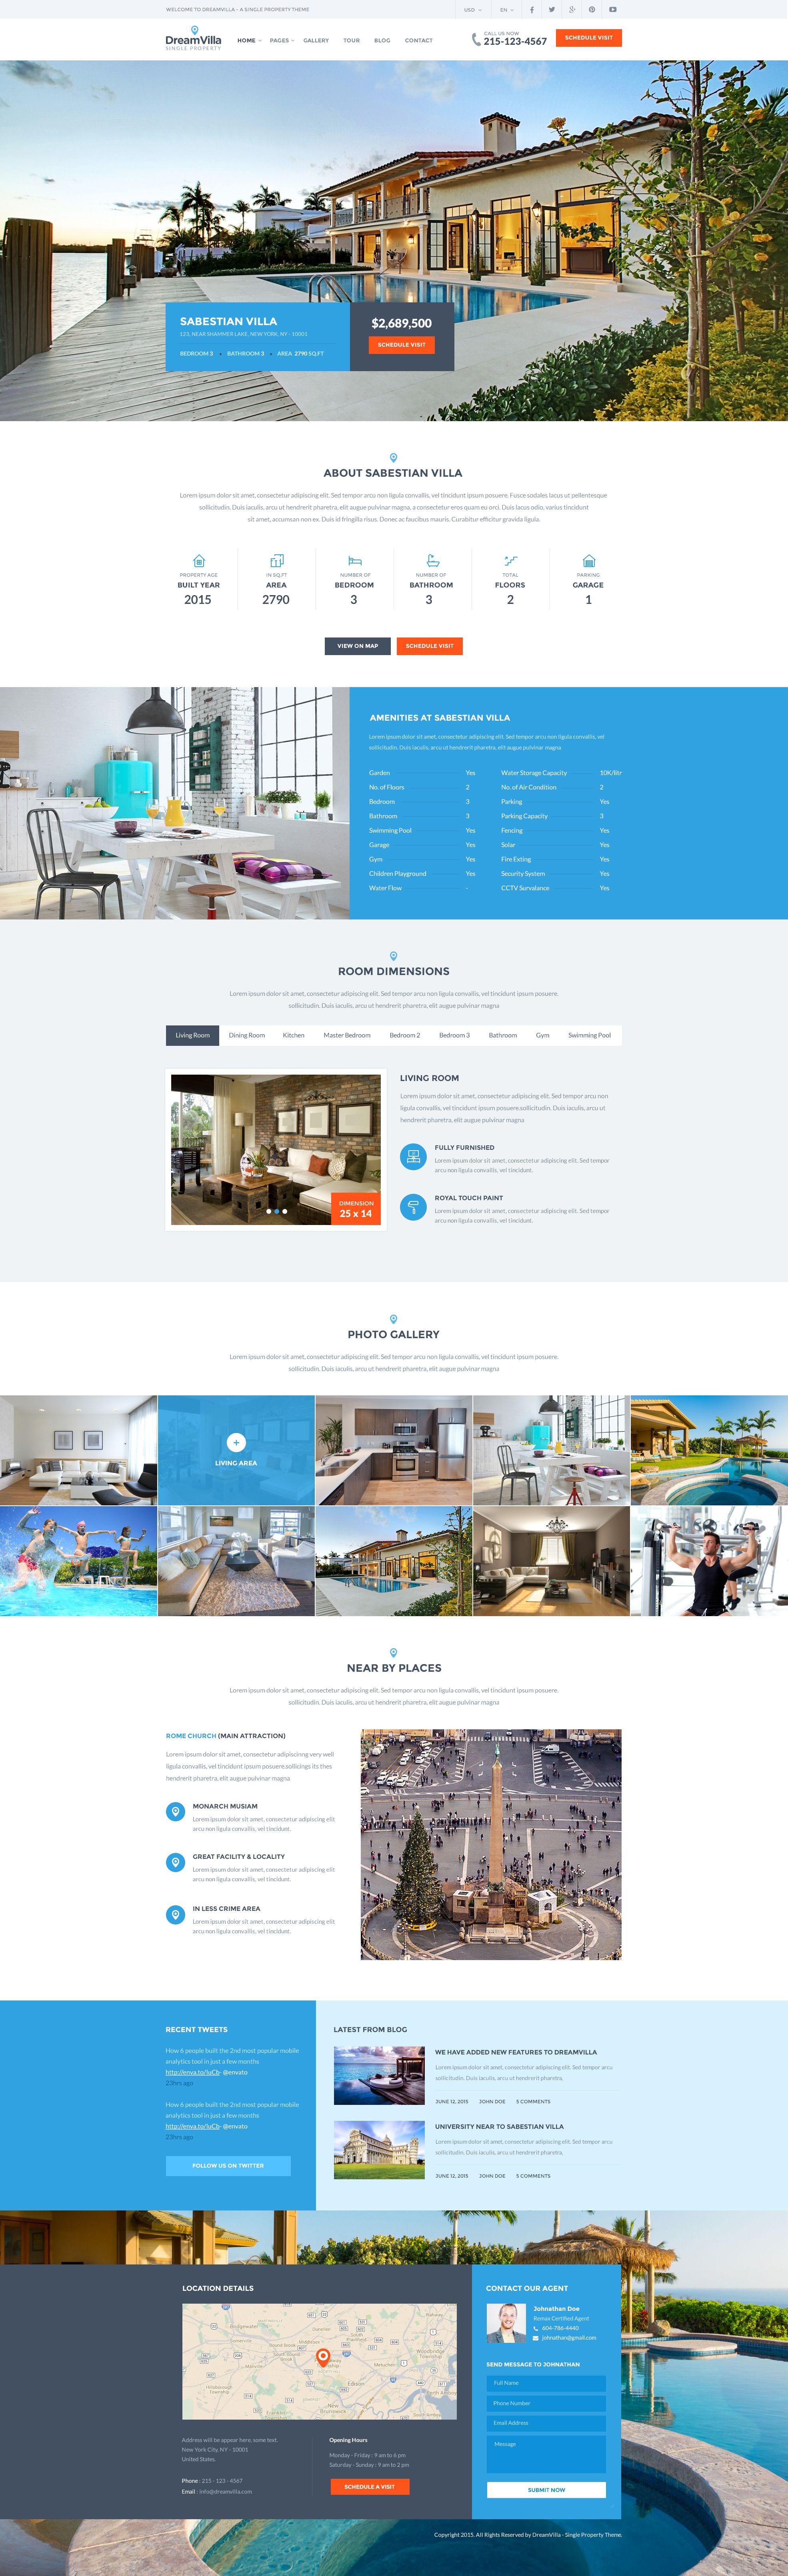 DreamVilla Single Property HTML Template DreamVilla